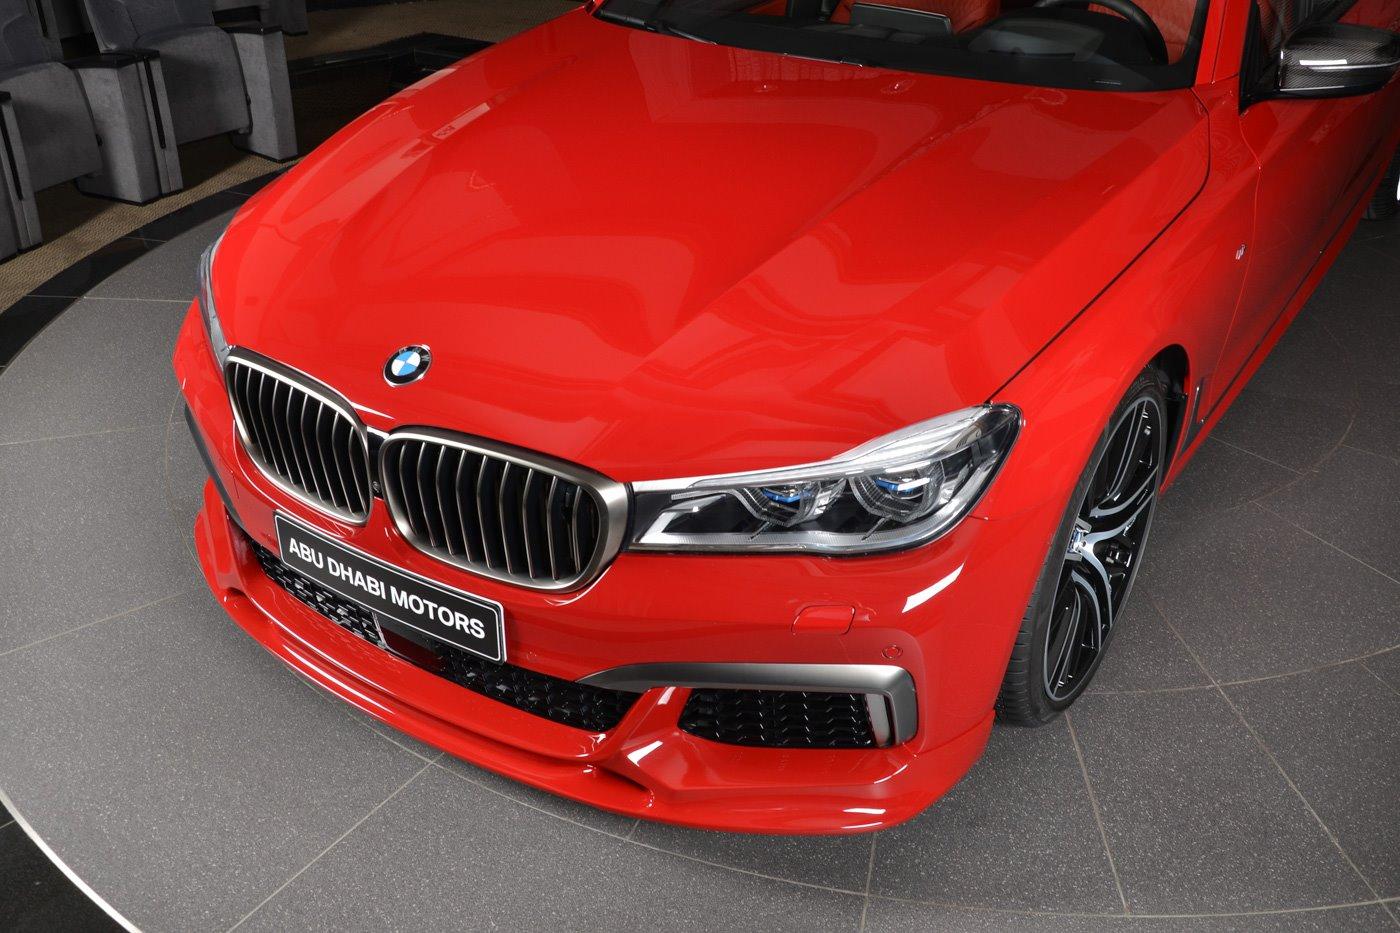 Imola Red Bmw M760li In Abu Dhabi Has Everything